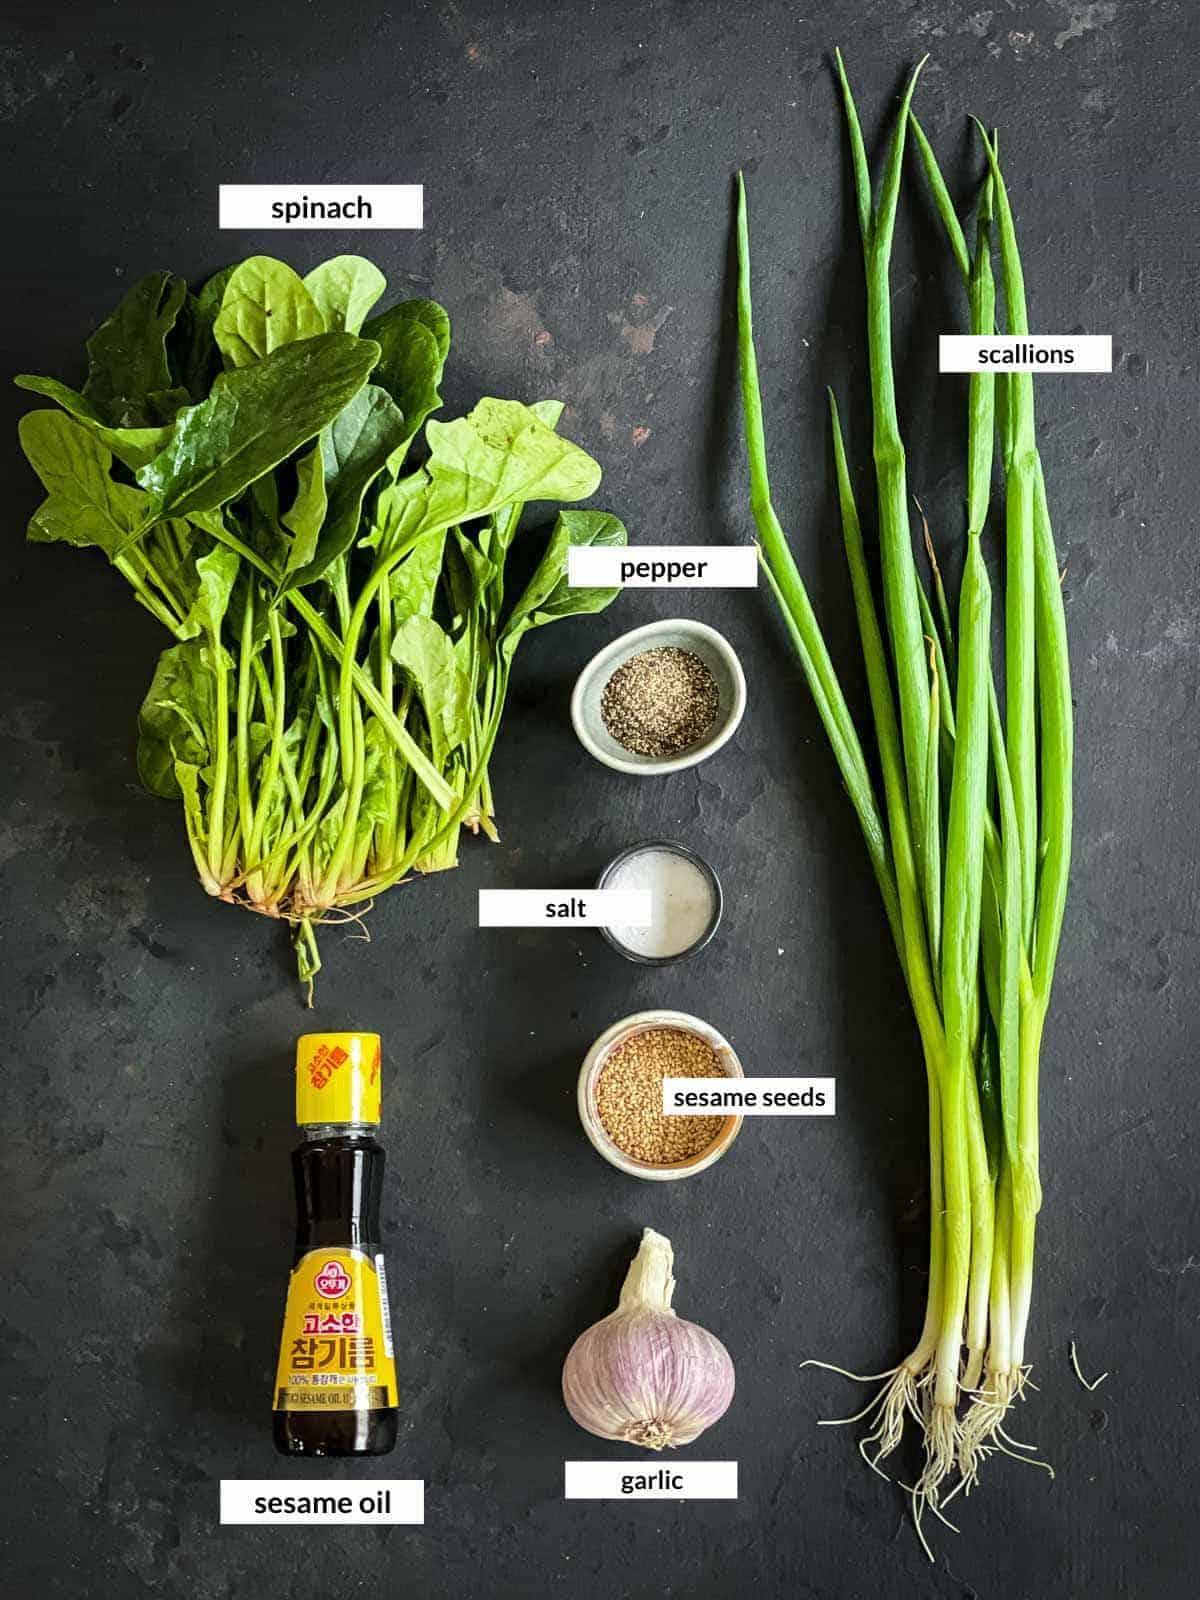 Korean Spinach Side Dish - Sigeumchi Namul Ingredients